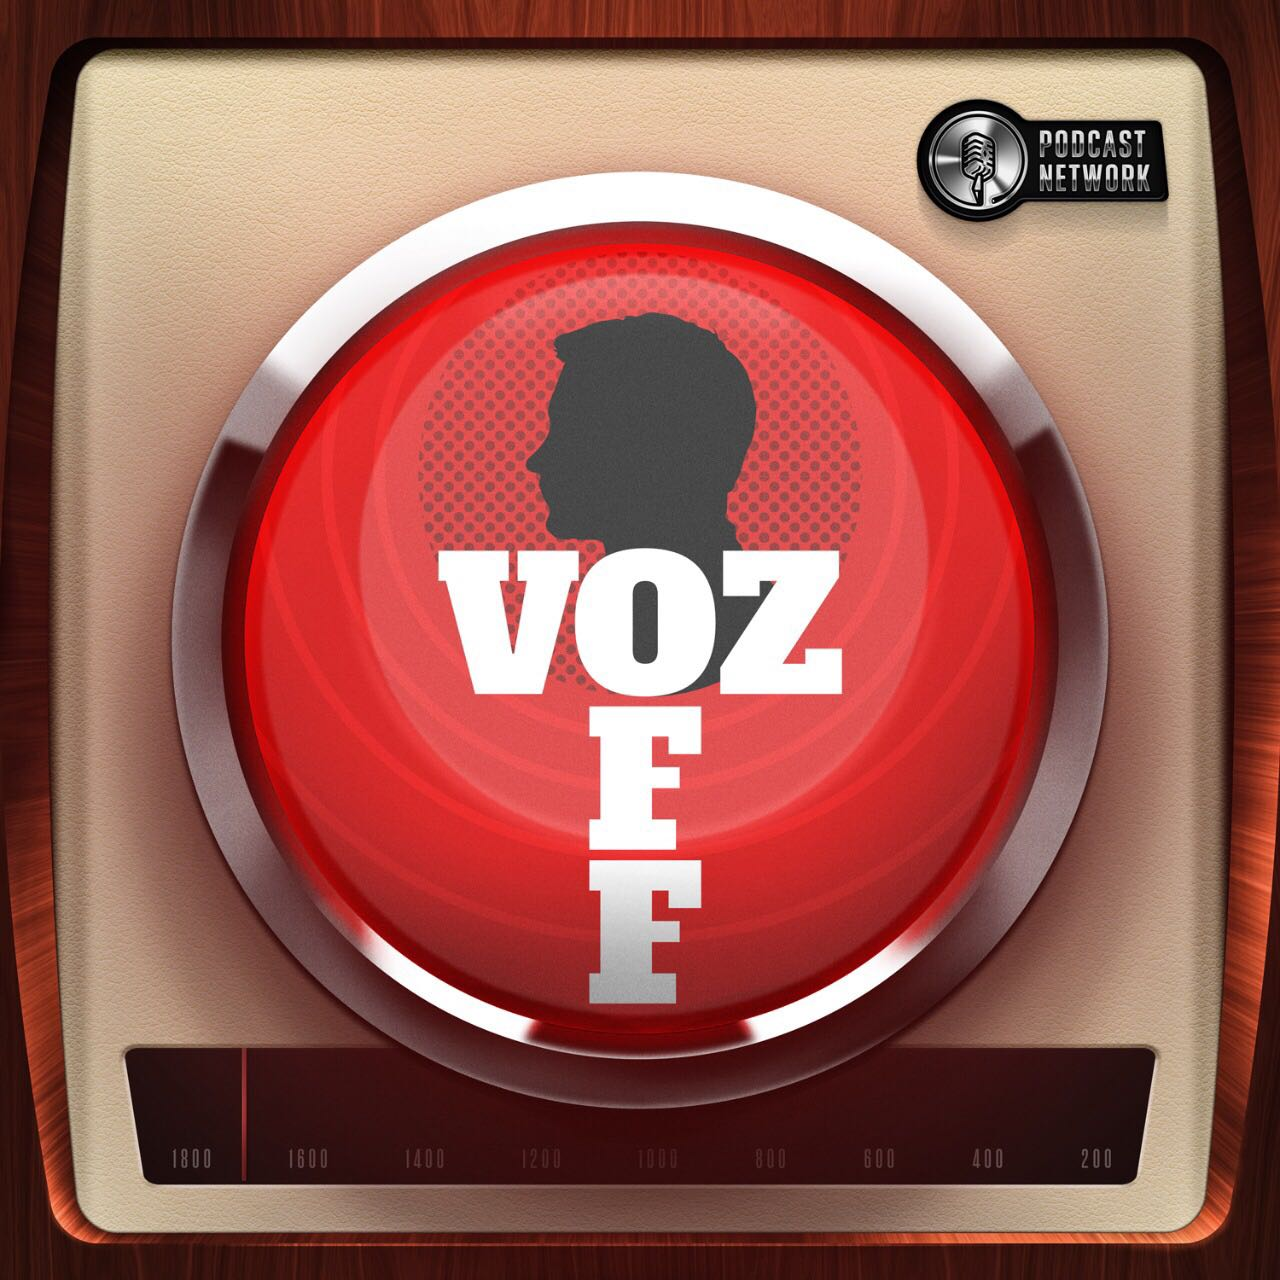 https://radiofobia.com.br/podcast/category/podcast/vozoff/